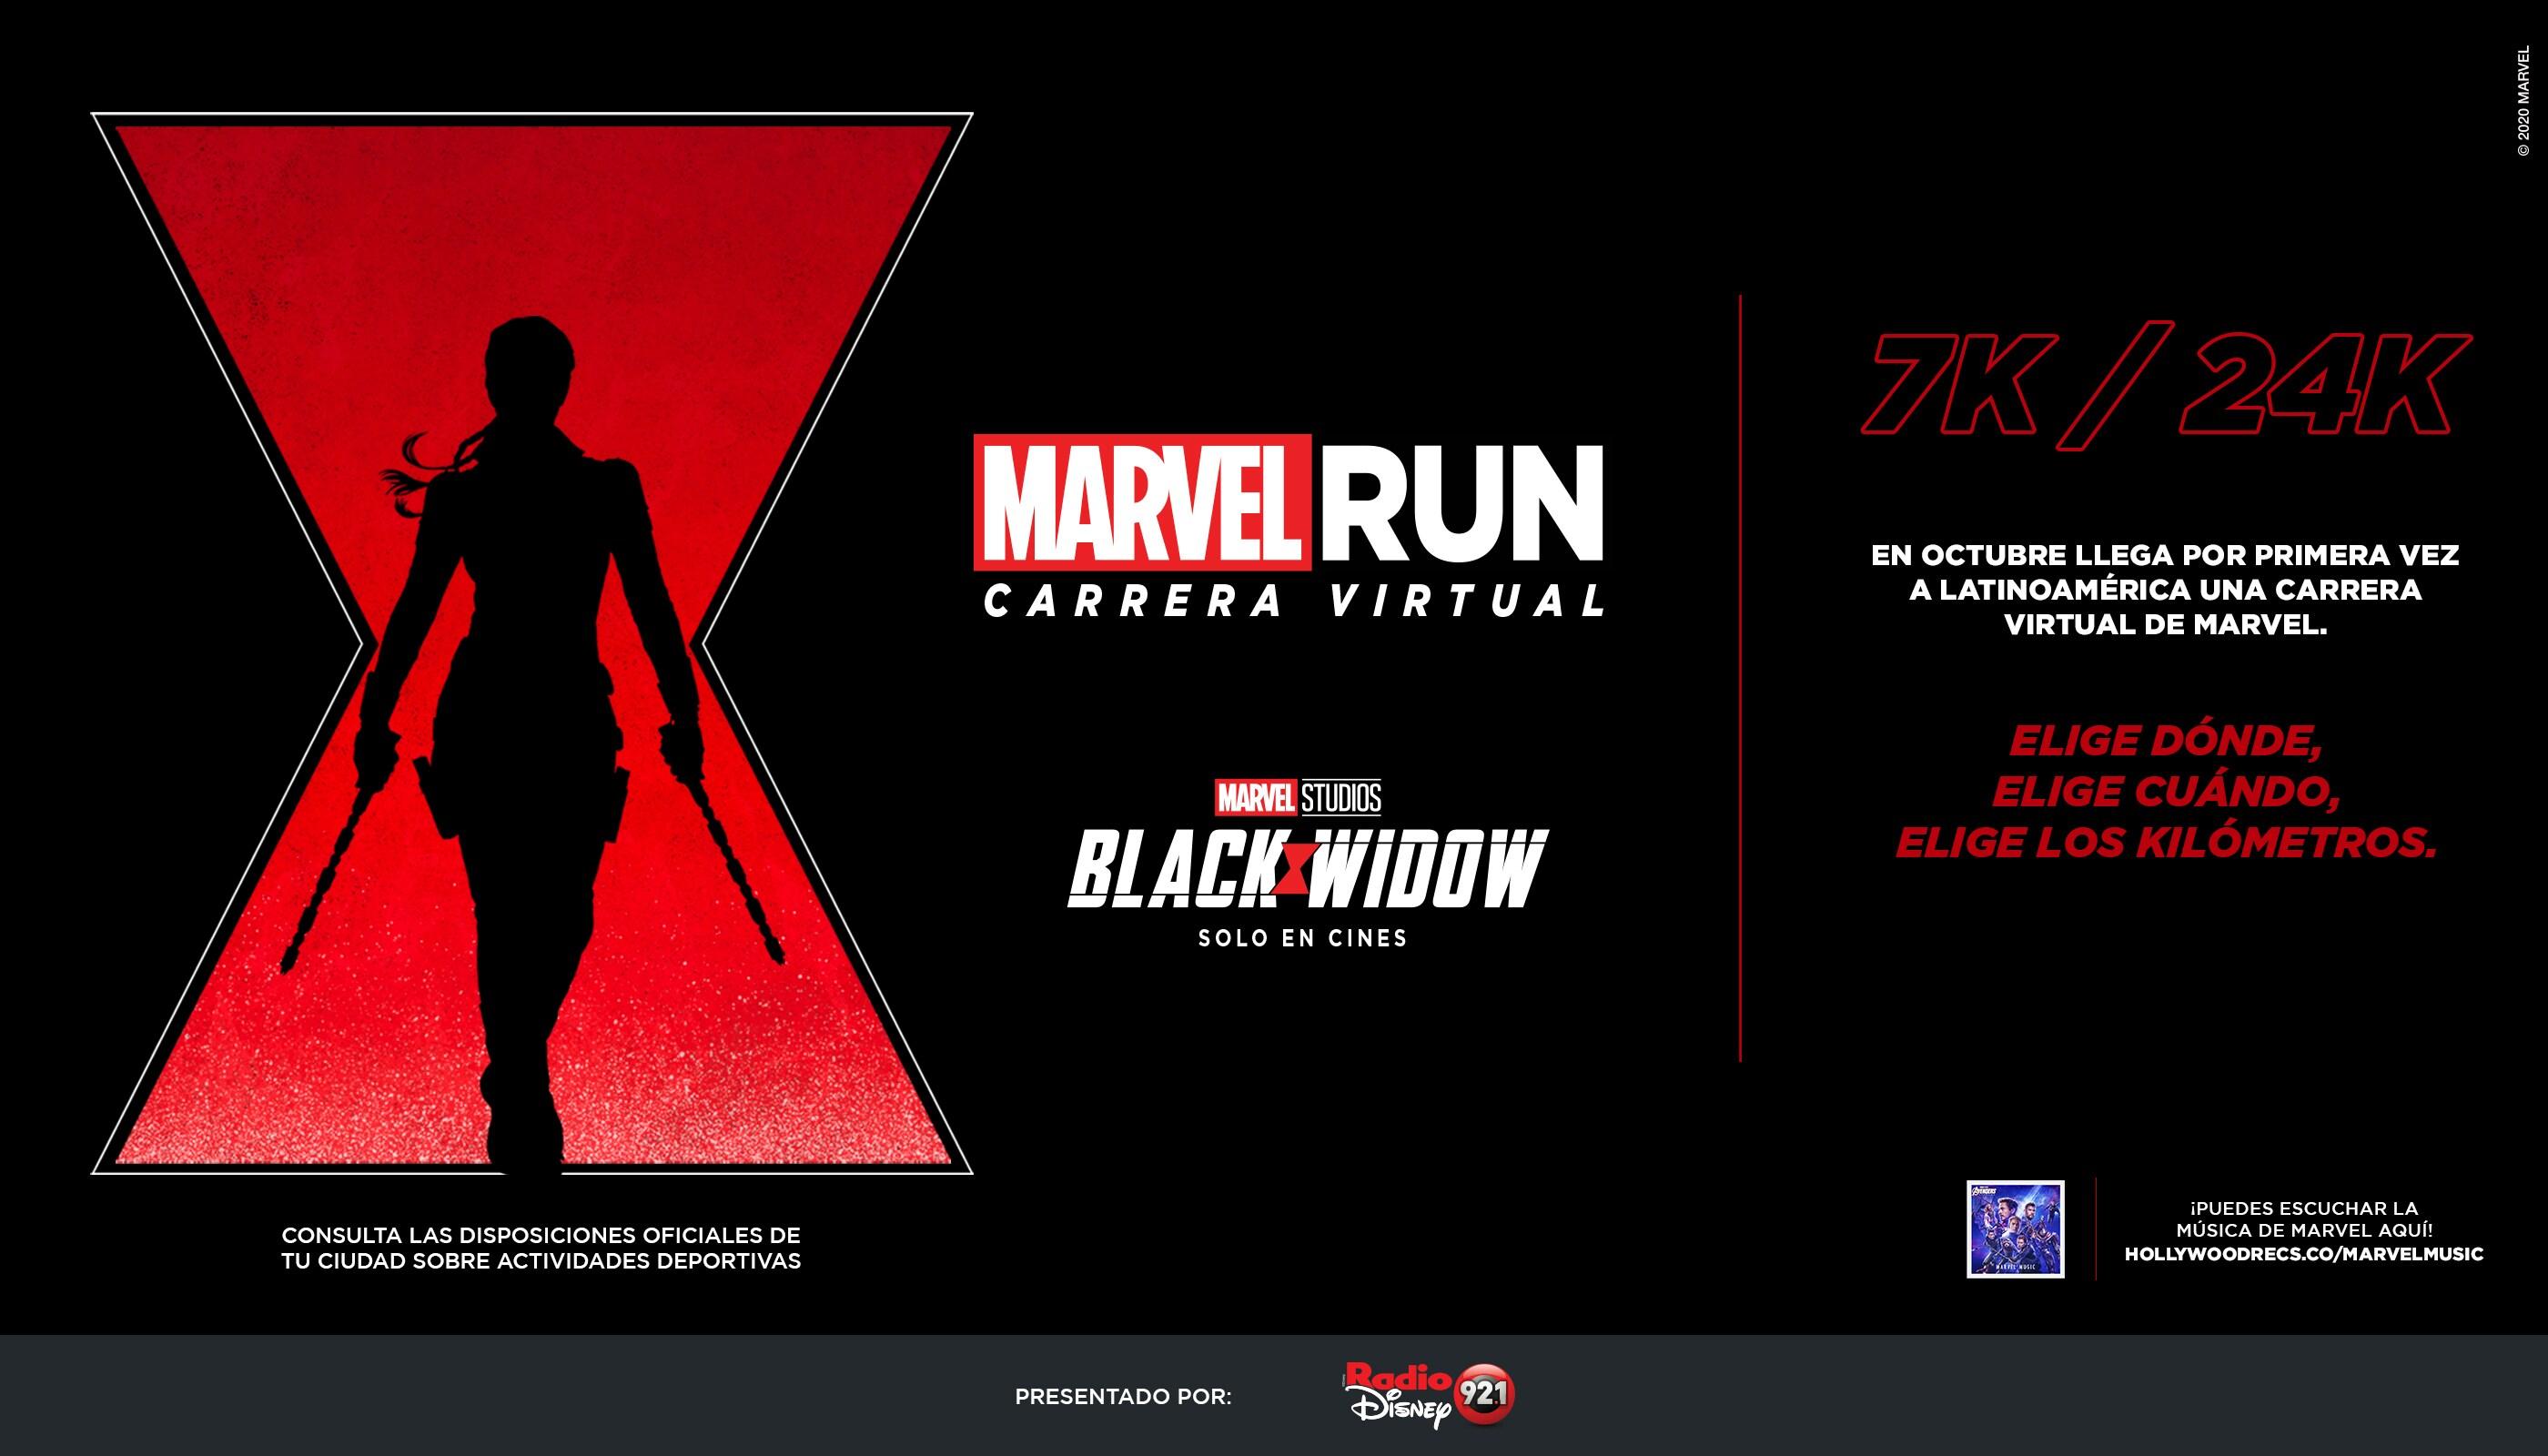 Marvel Run Mx